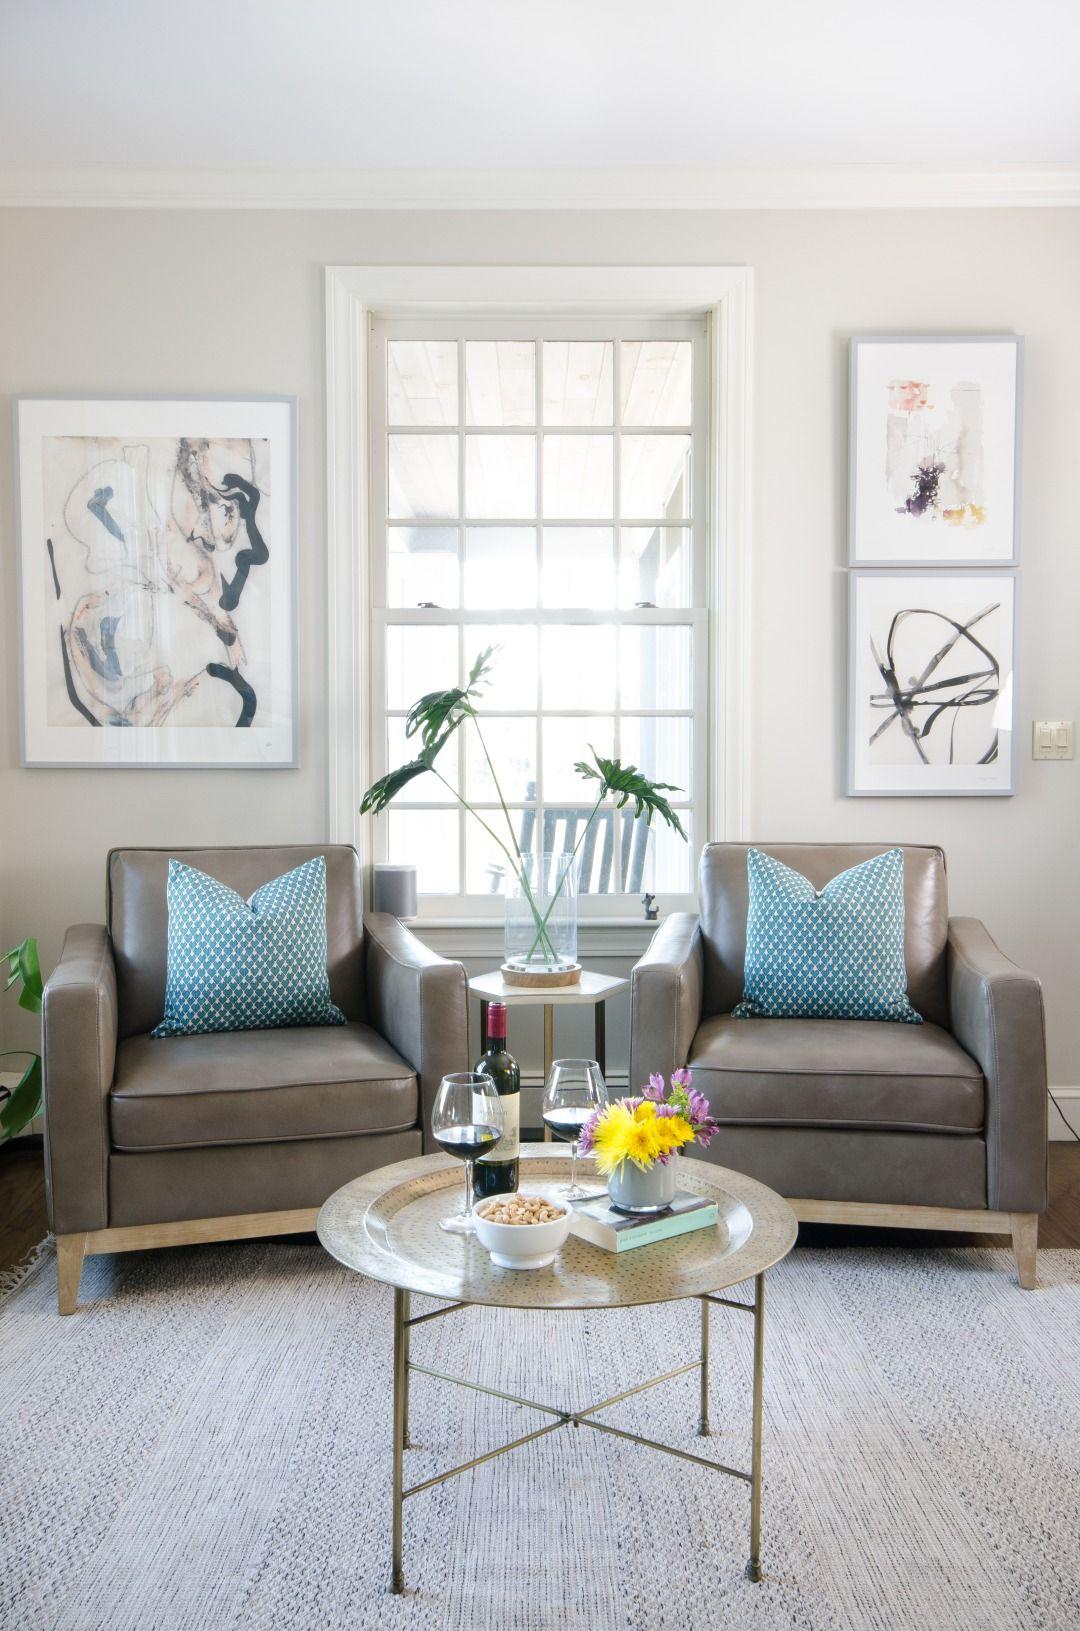 Family Room Makeover Reveal The Chronicles Of Home Simple Living Room Decor Family Room Makeover Family Room Design